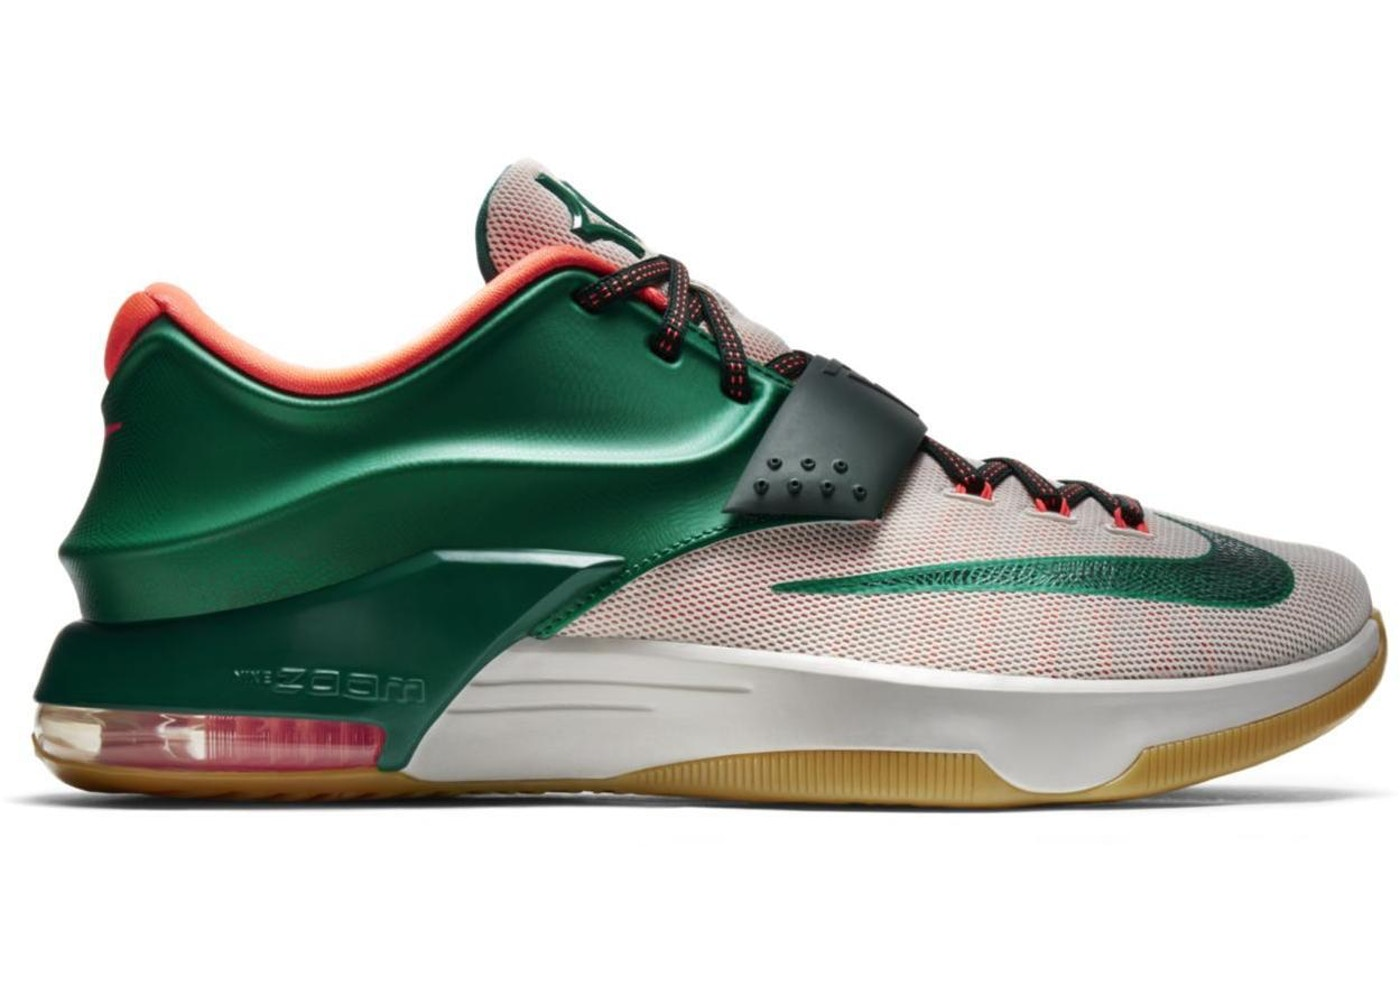 7821ed3c8c9 Buy Nike KD 7 Shoes   Deadstock Sneakers